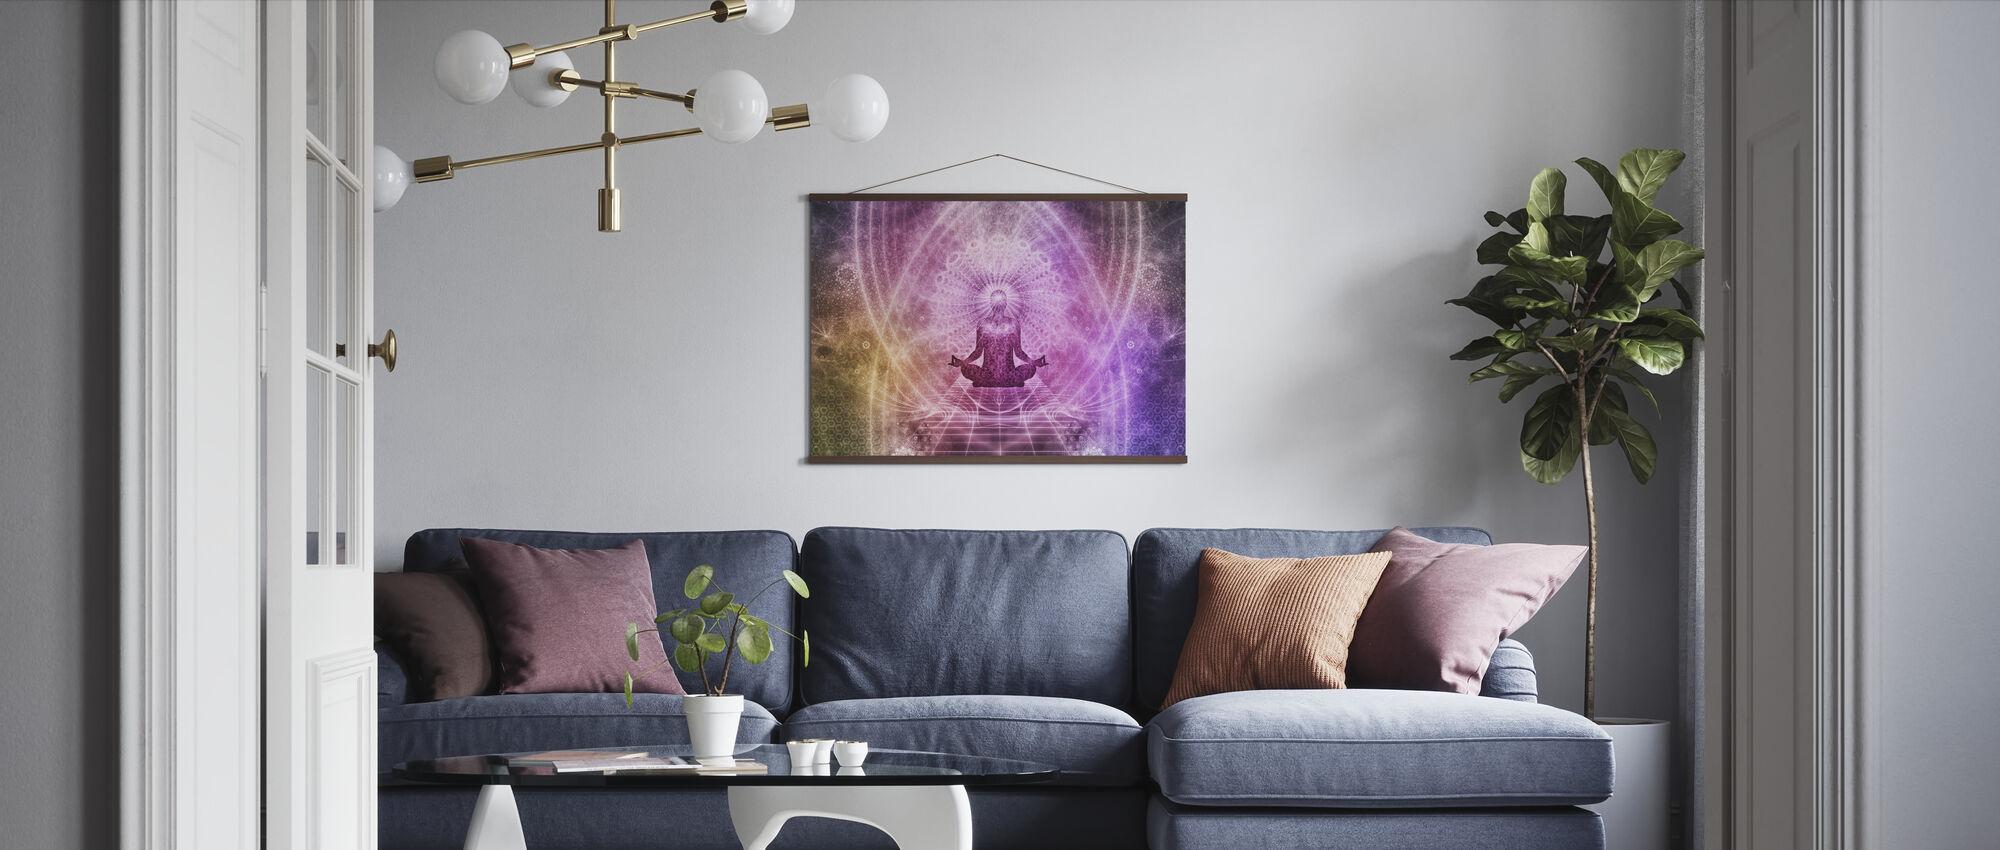 Åndelig meditation - Plakat - Stue